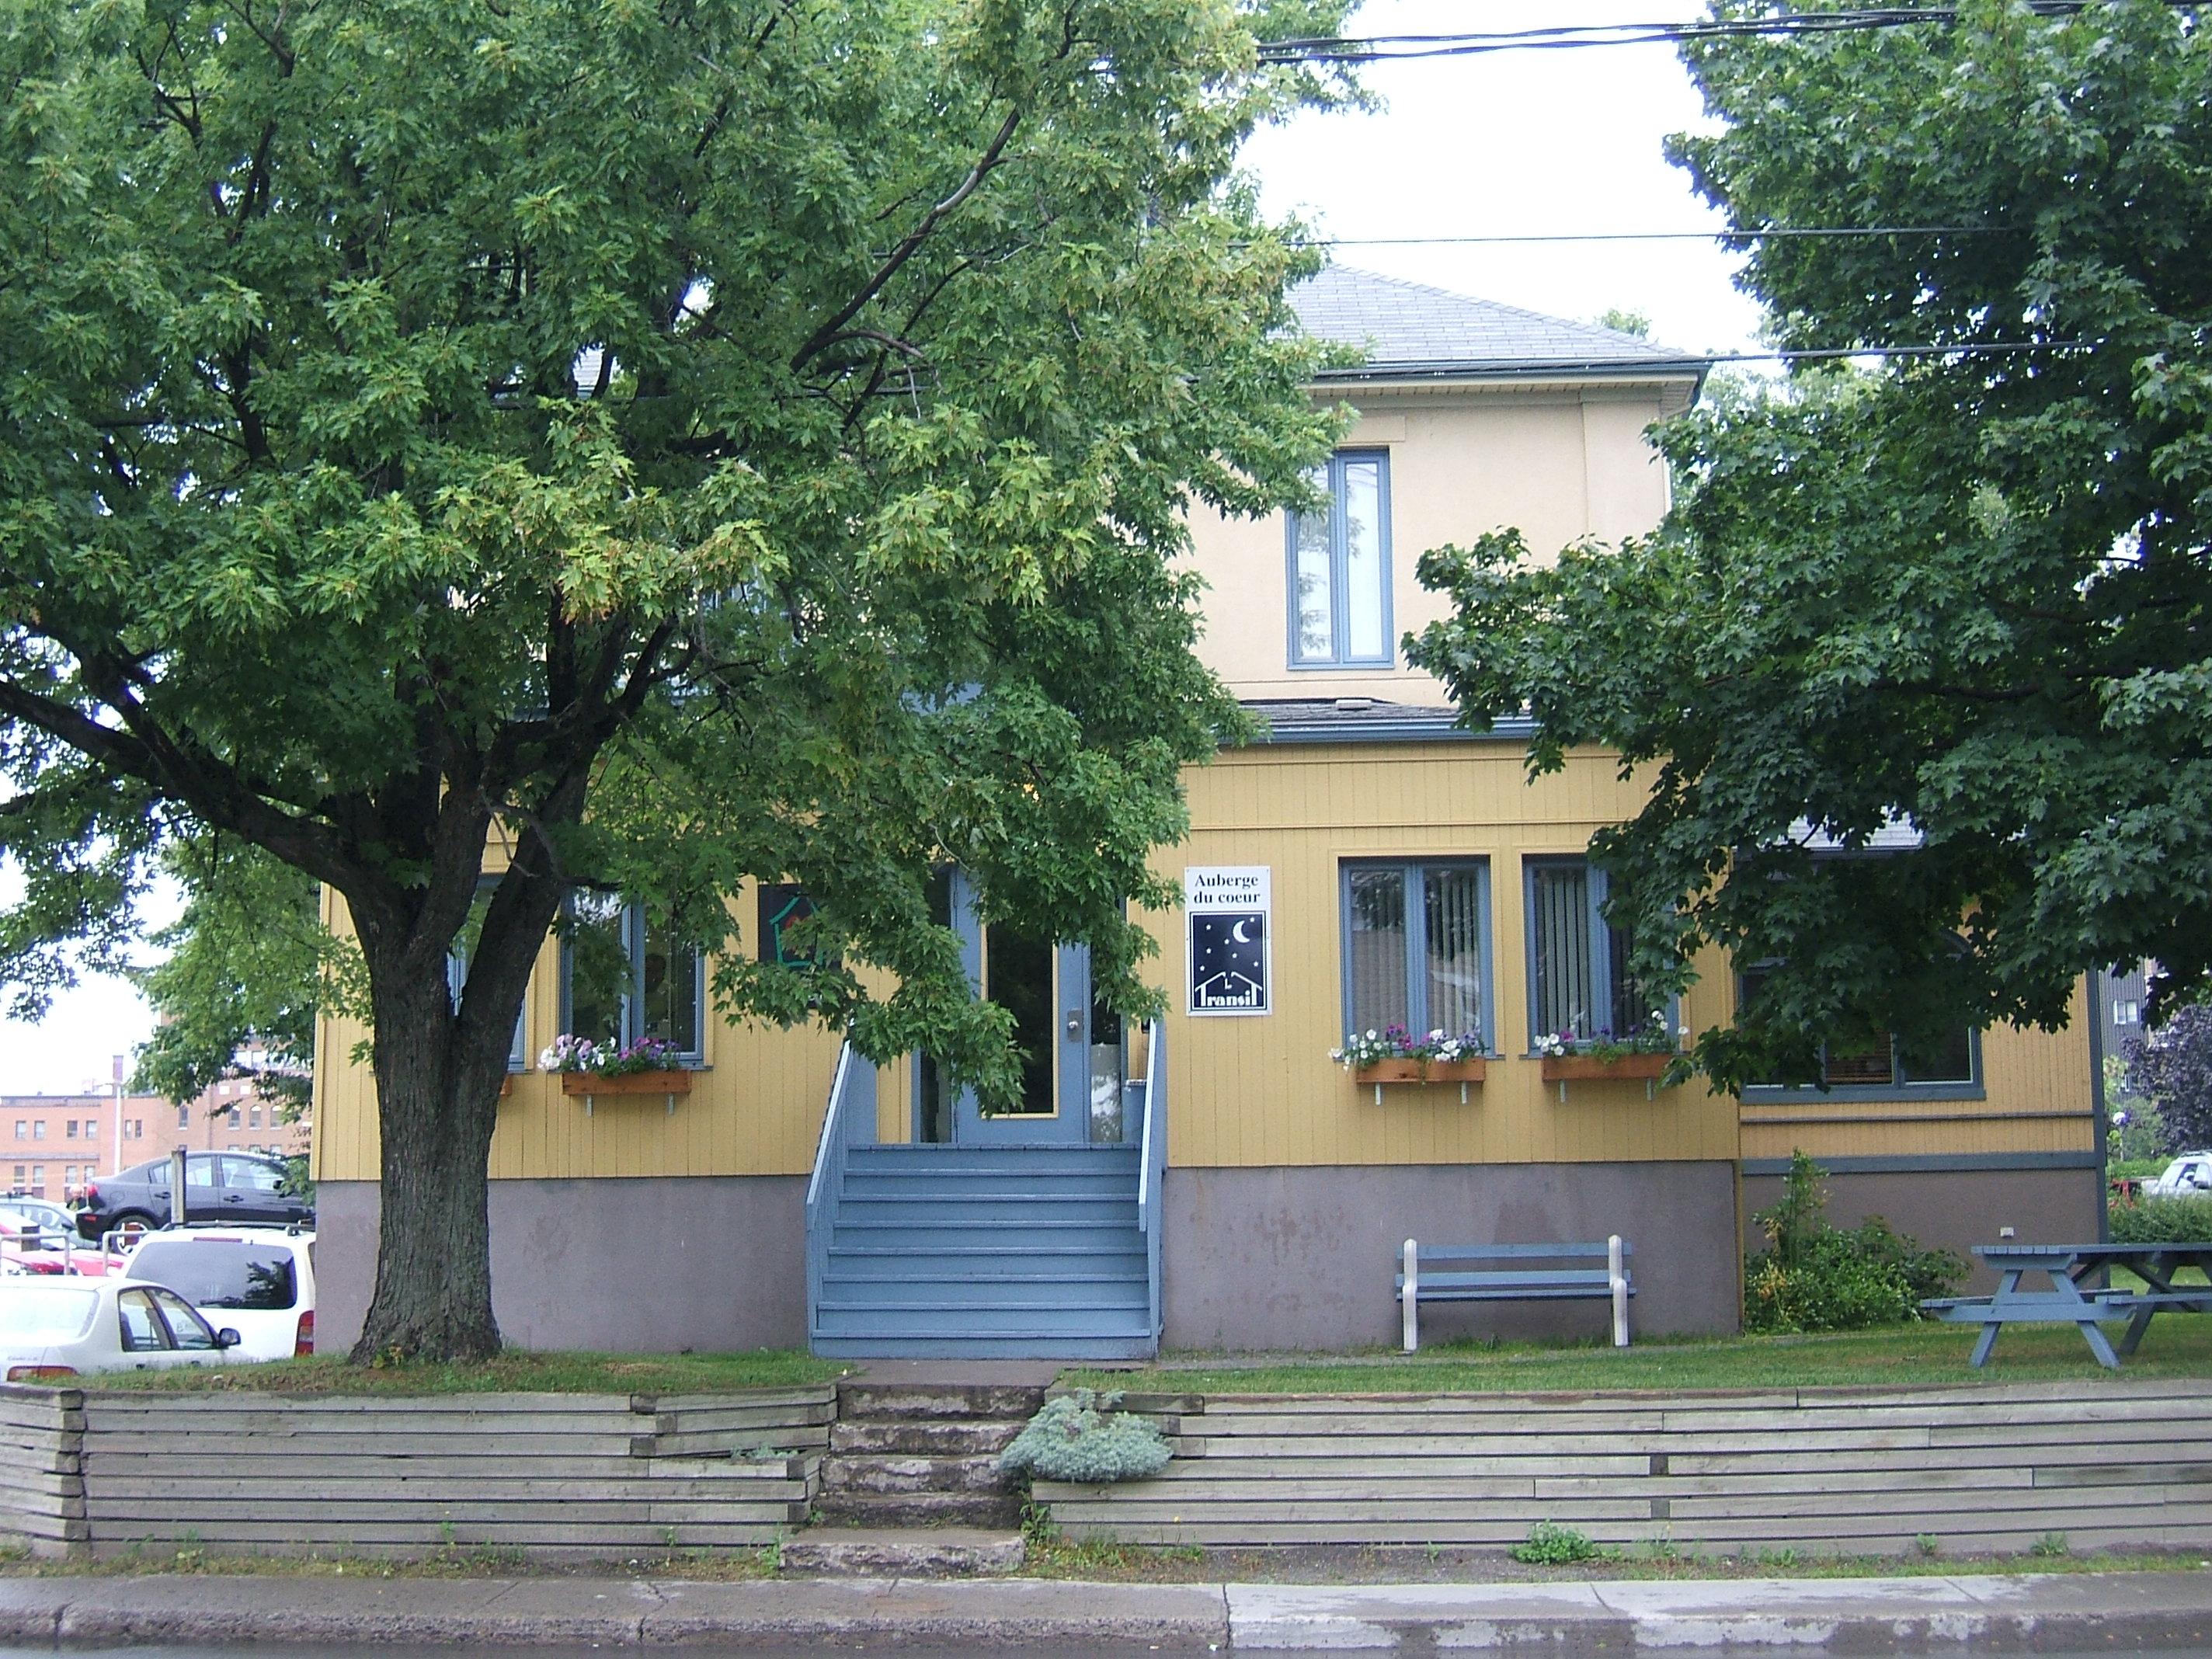 1183 - 186, avenue Rouleau